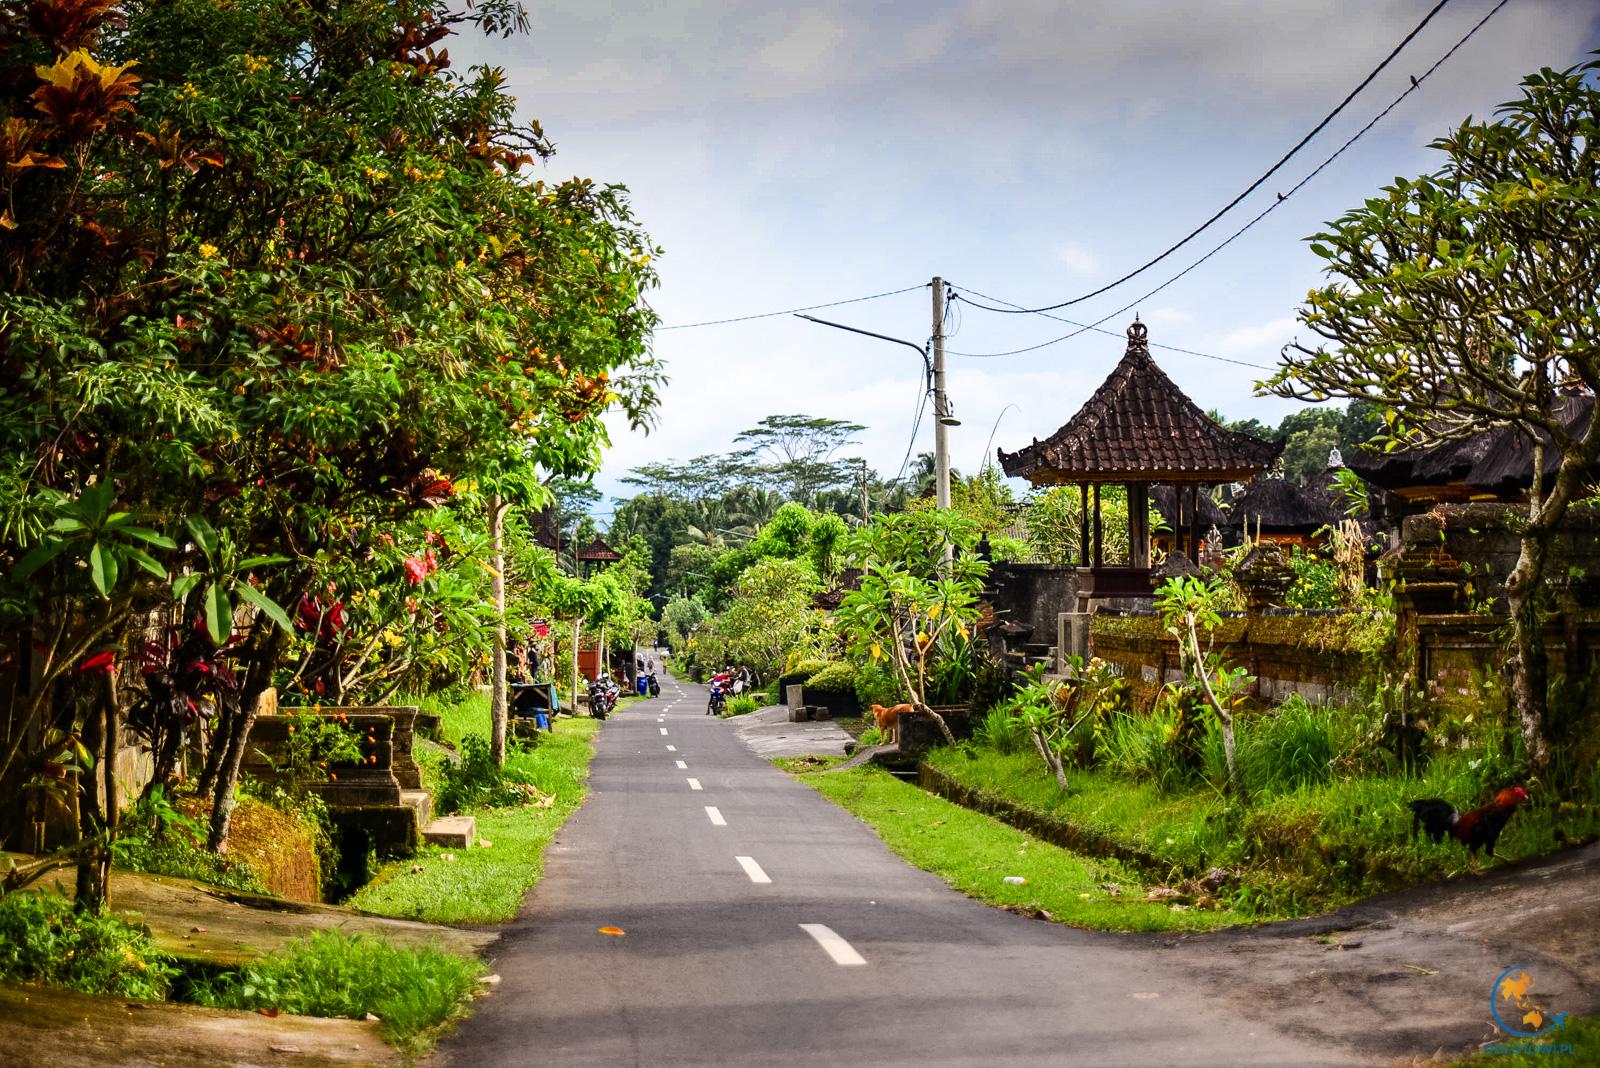 Kelusa Village wioska na trasie do chatek Hati Padi